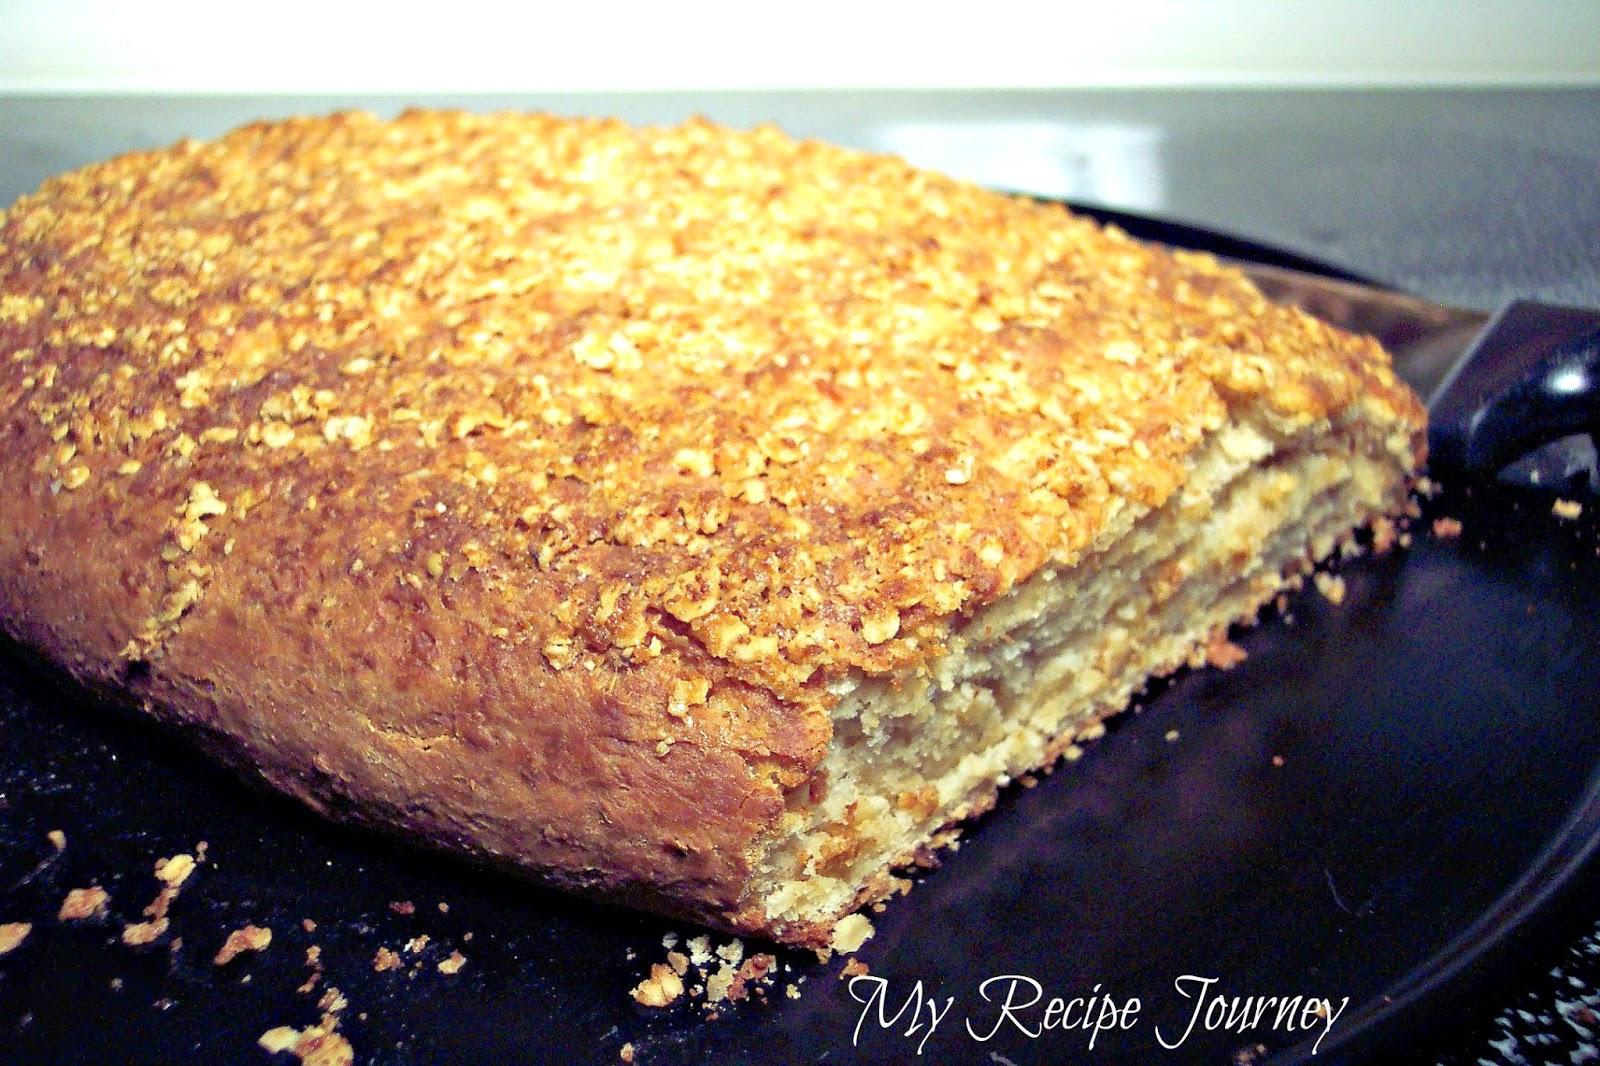 Sweet n' Salty Topped Oatmeal Bread